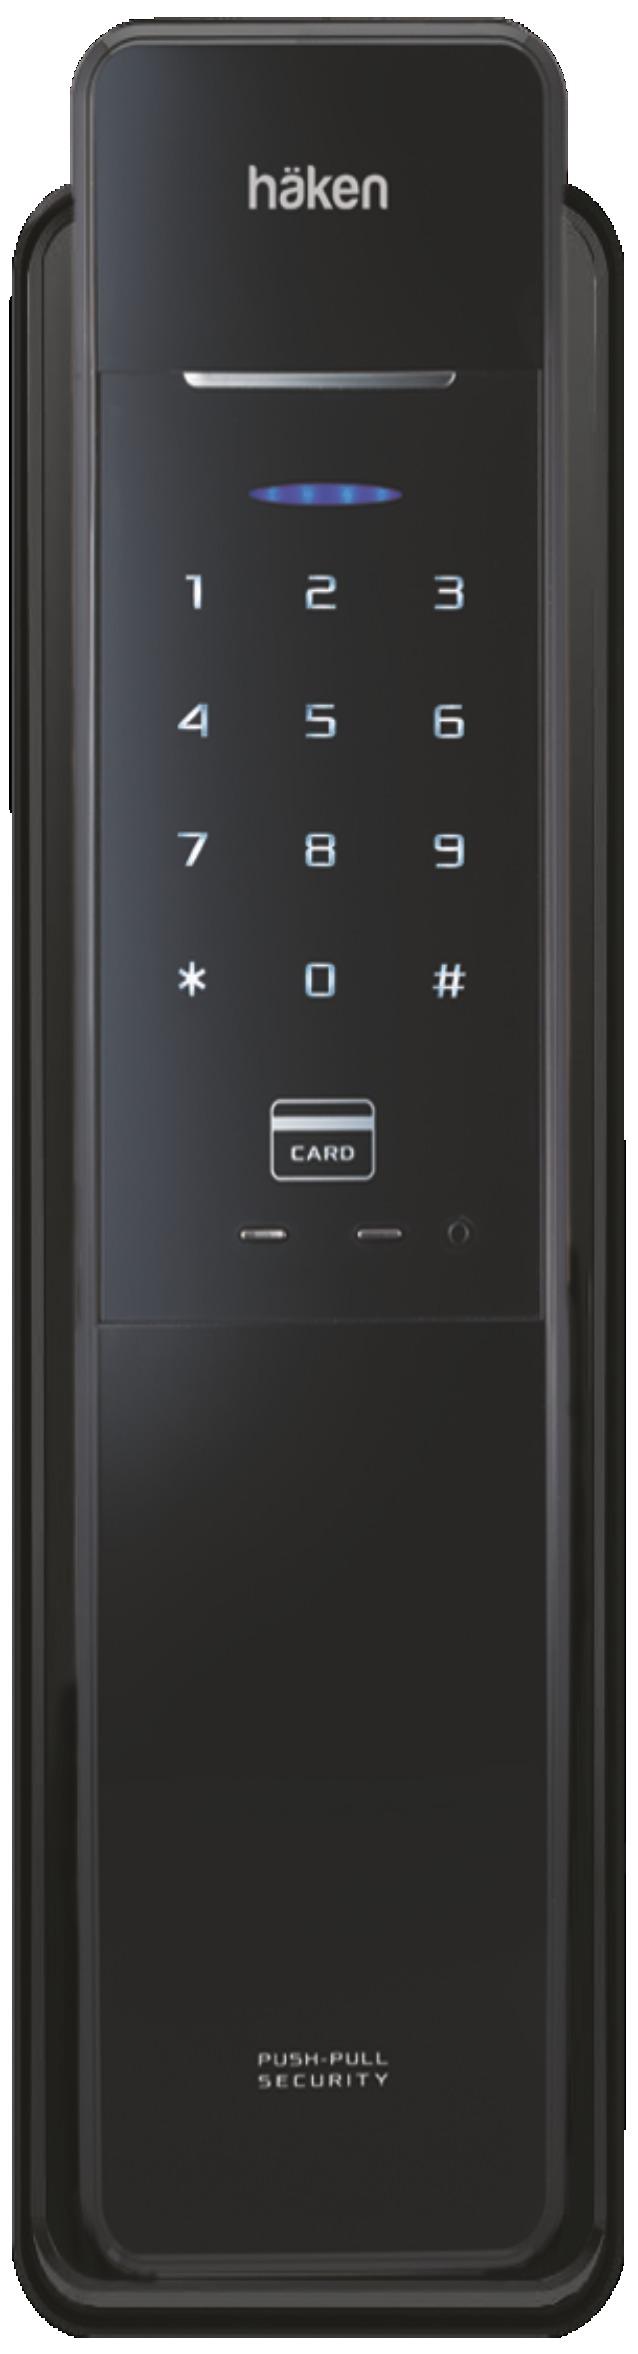 Digital Door Locks Hdl-PP53 Mini Pushpull Lock